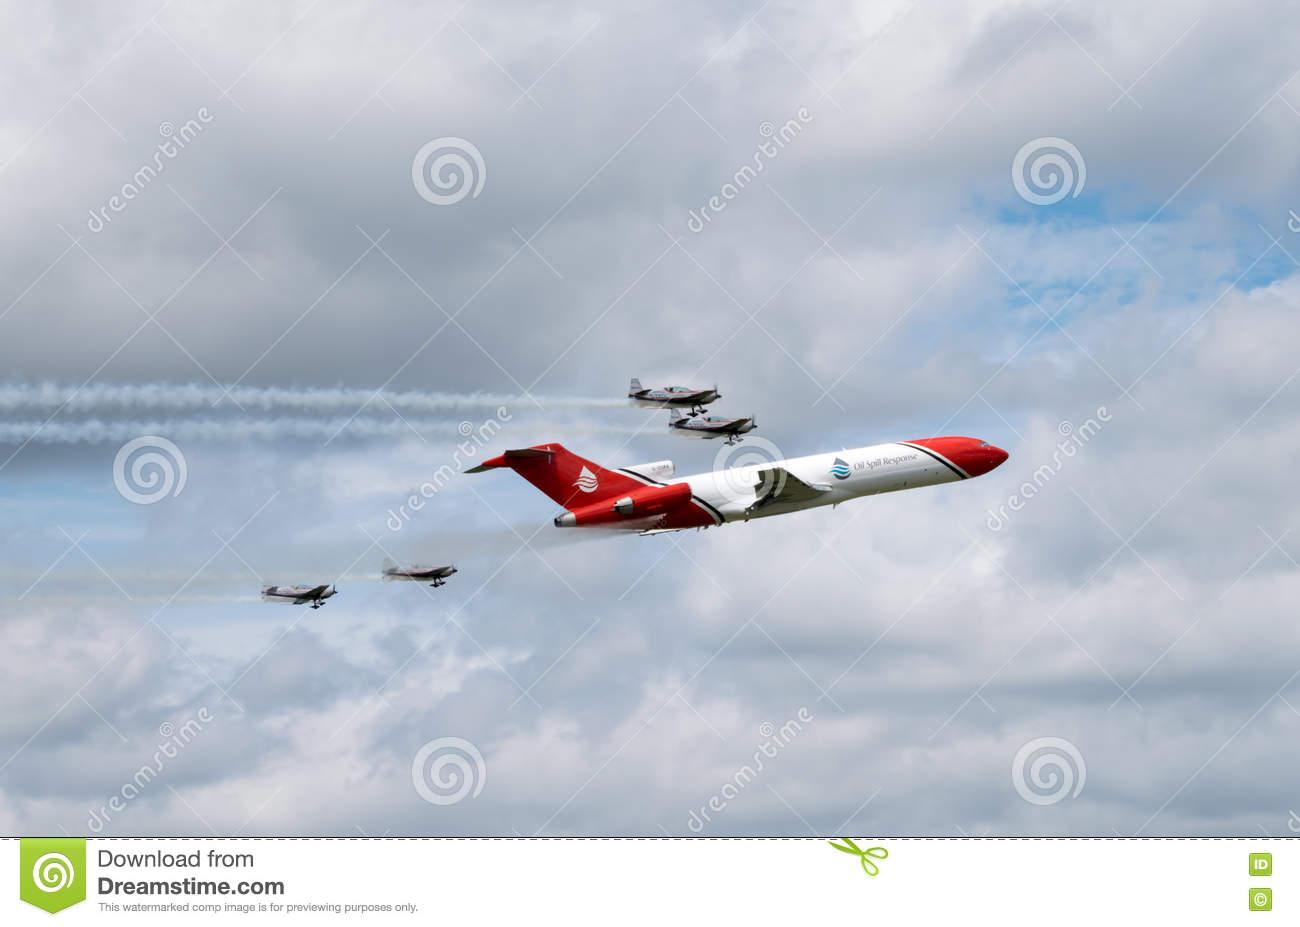 Boeing 727 Oil Response Plane At Farnborough Airshow 2016.